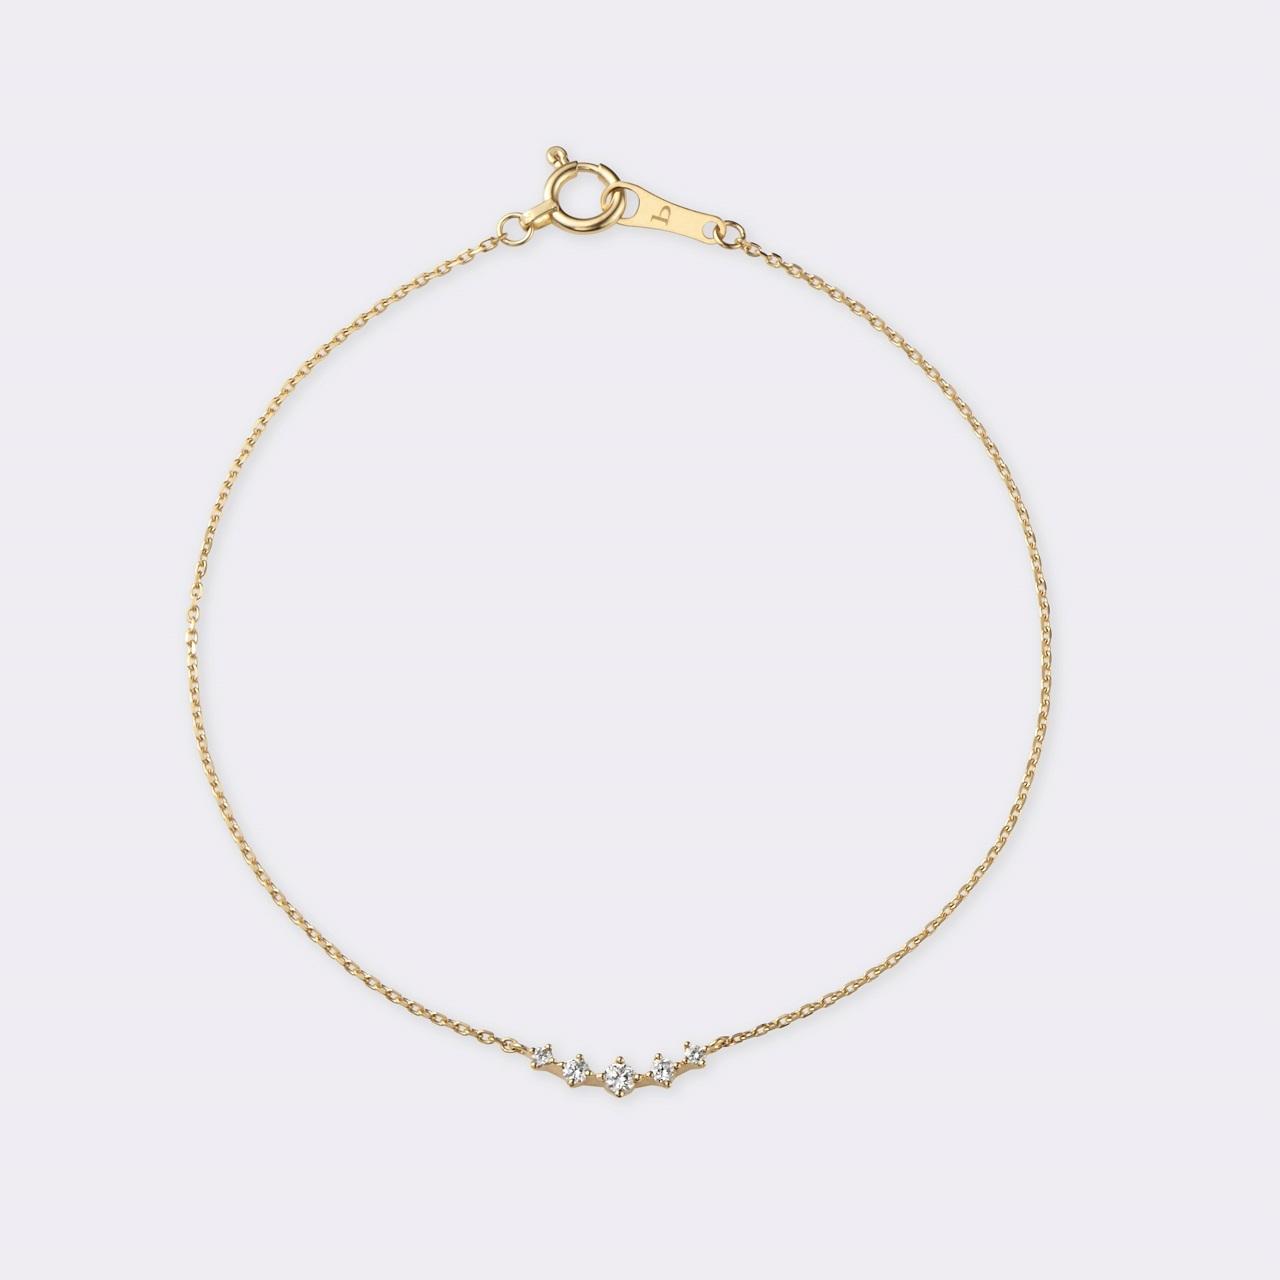 Fleur Bracelet K18YG( フルールブレスレット K18イエローゴールド)